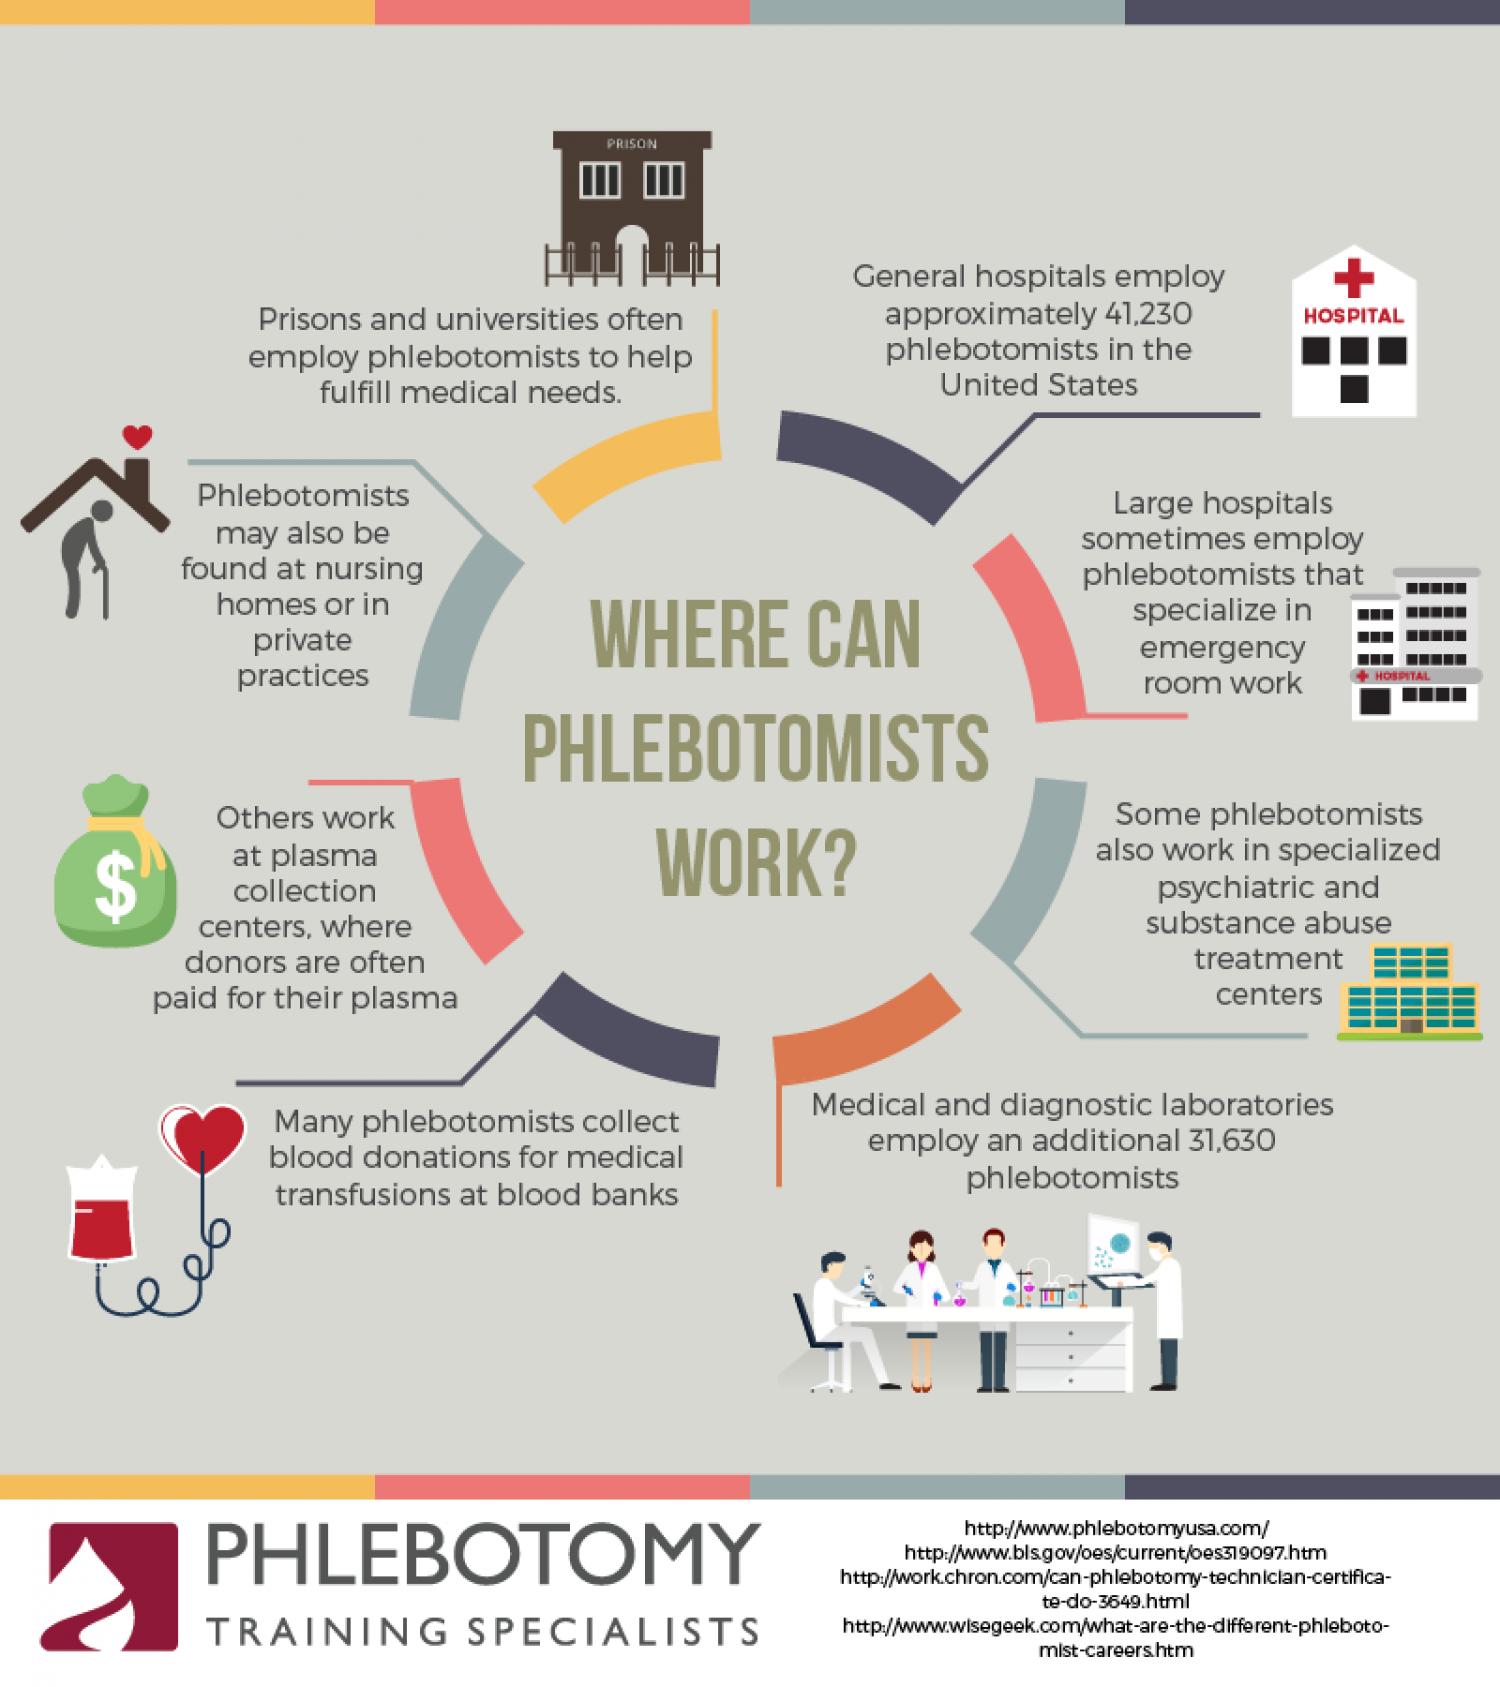 Phlebotomy Training Specialists Phlebotomyt0379 On Pinterest